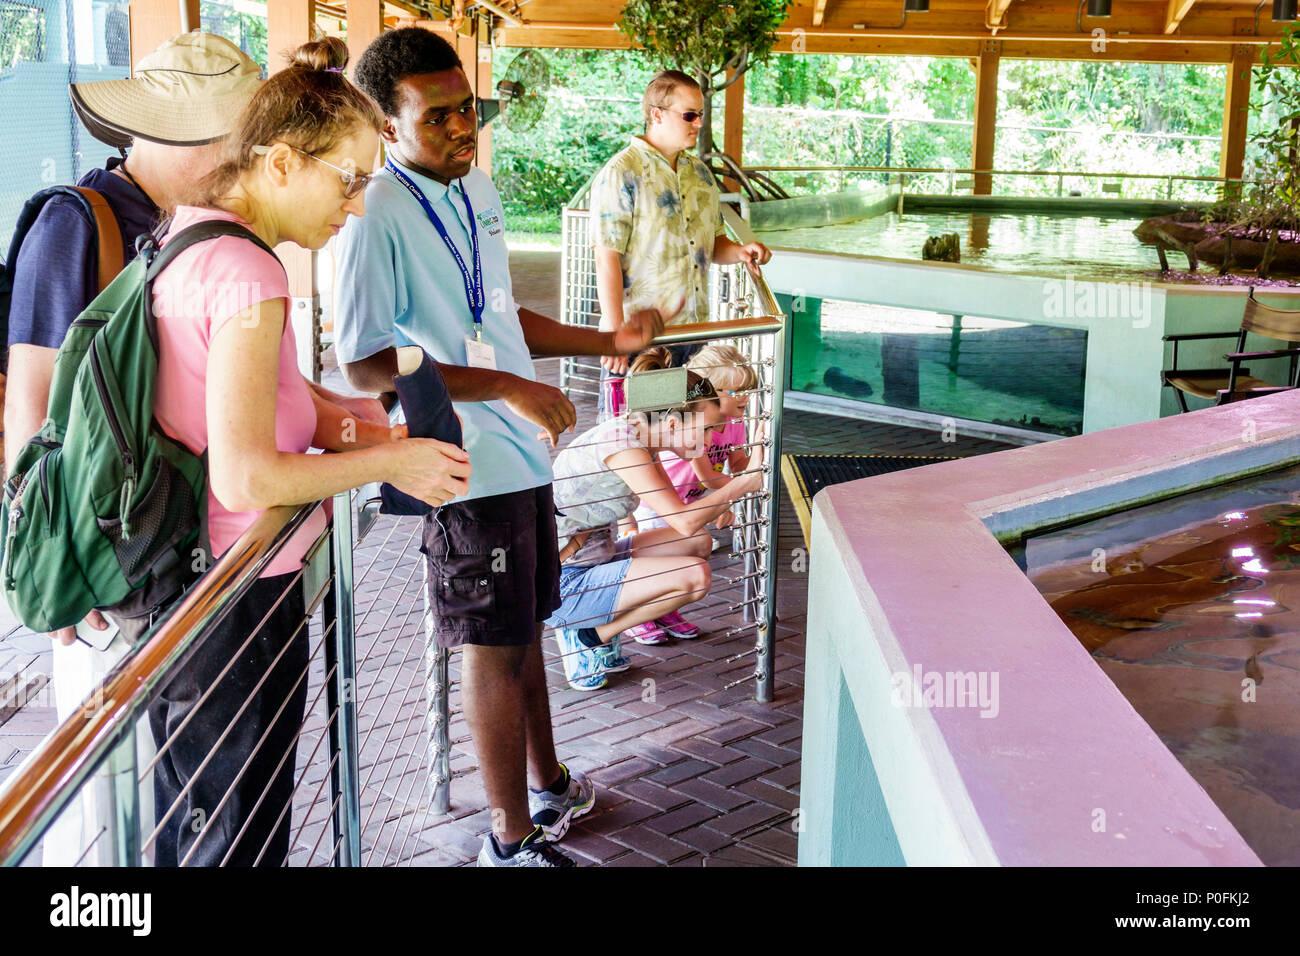 Florida Boca Raton Gumbo Limbo Nature Center Environmental Complex aquarium sea life ecosystem Black man woman boy teen student volunteer - Stock Image